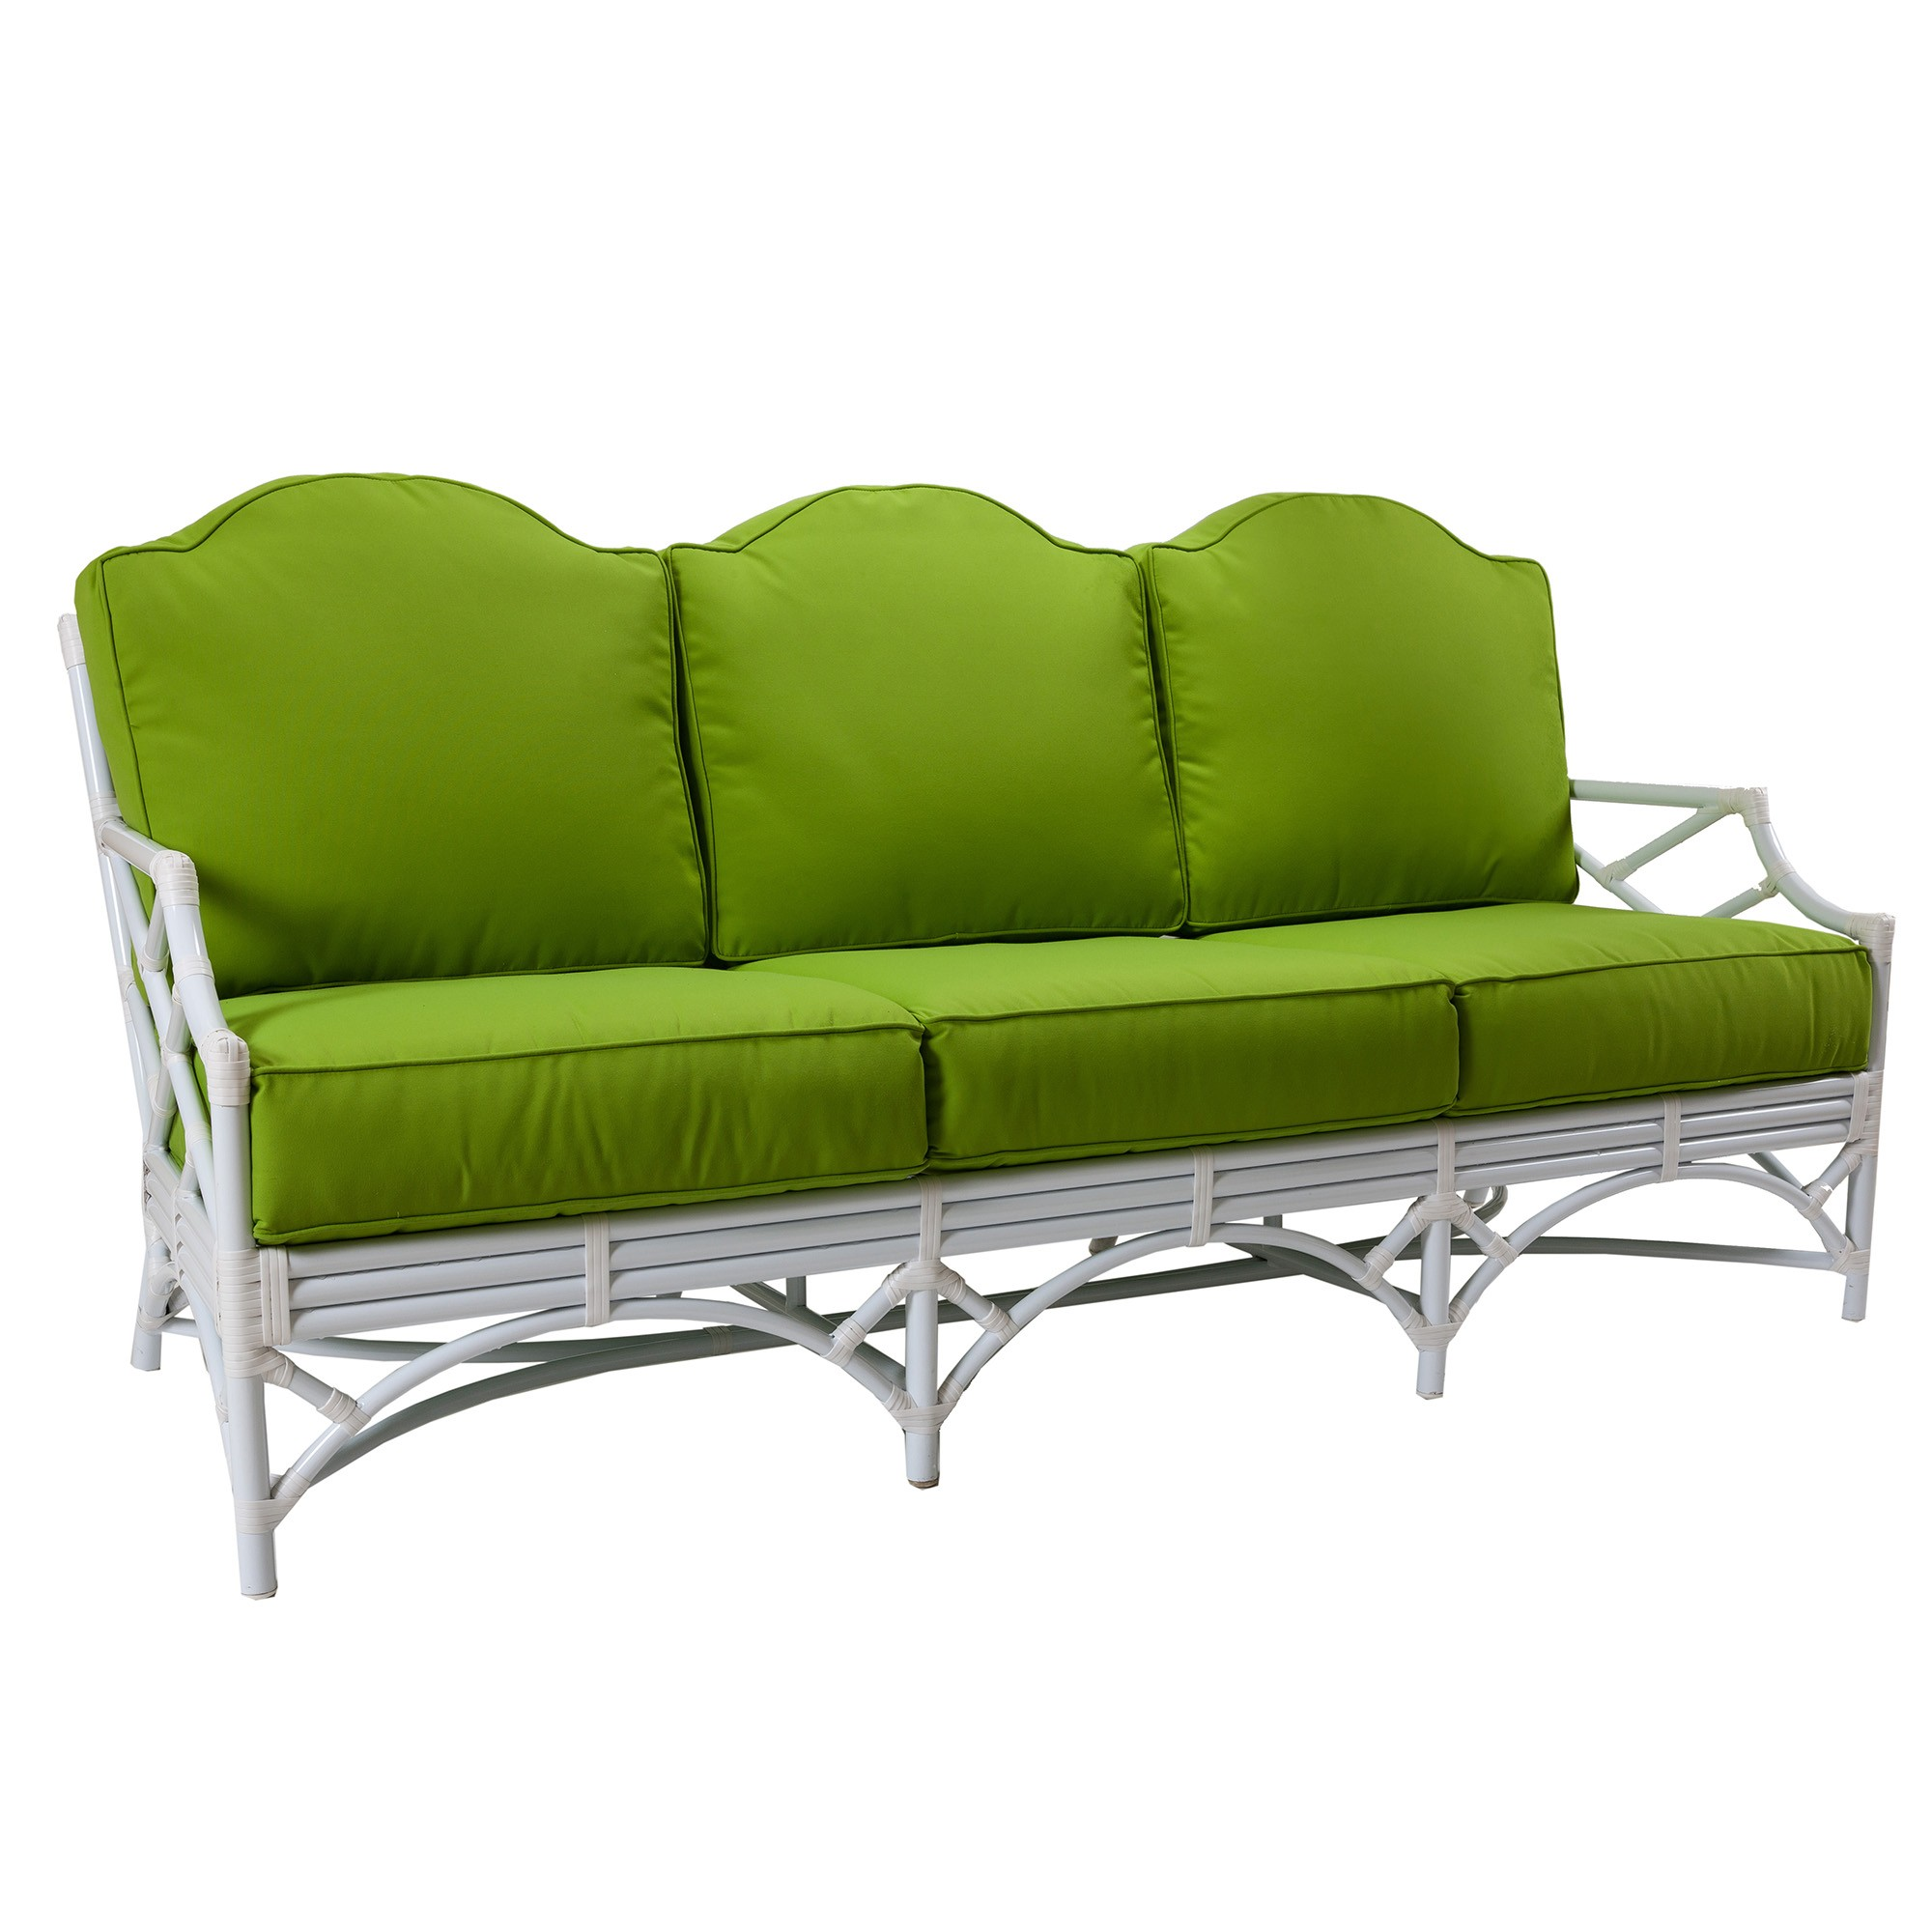 Full Size of Chippendale Sofa Outdoor Sunbrella David Francis Aw8082 S Kolonialstil Big Grau Schillig Mit Abnehmbaren Bezug Schlaffunktion Impressionen Schlafsofa Sofa Chippendale Sofa